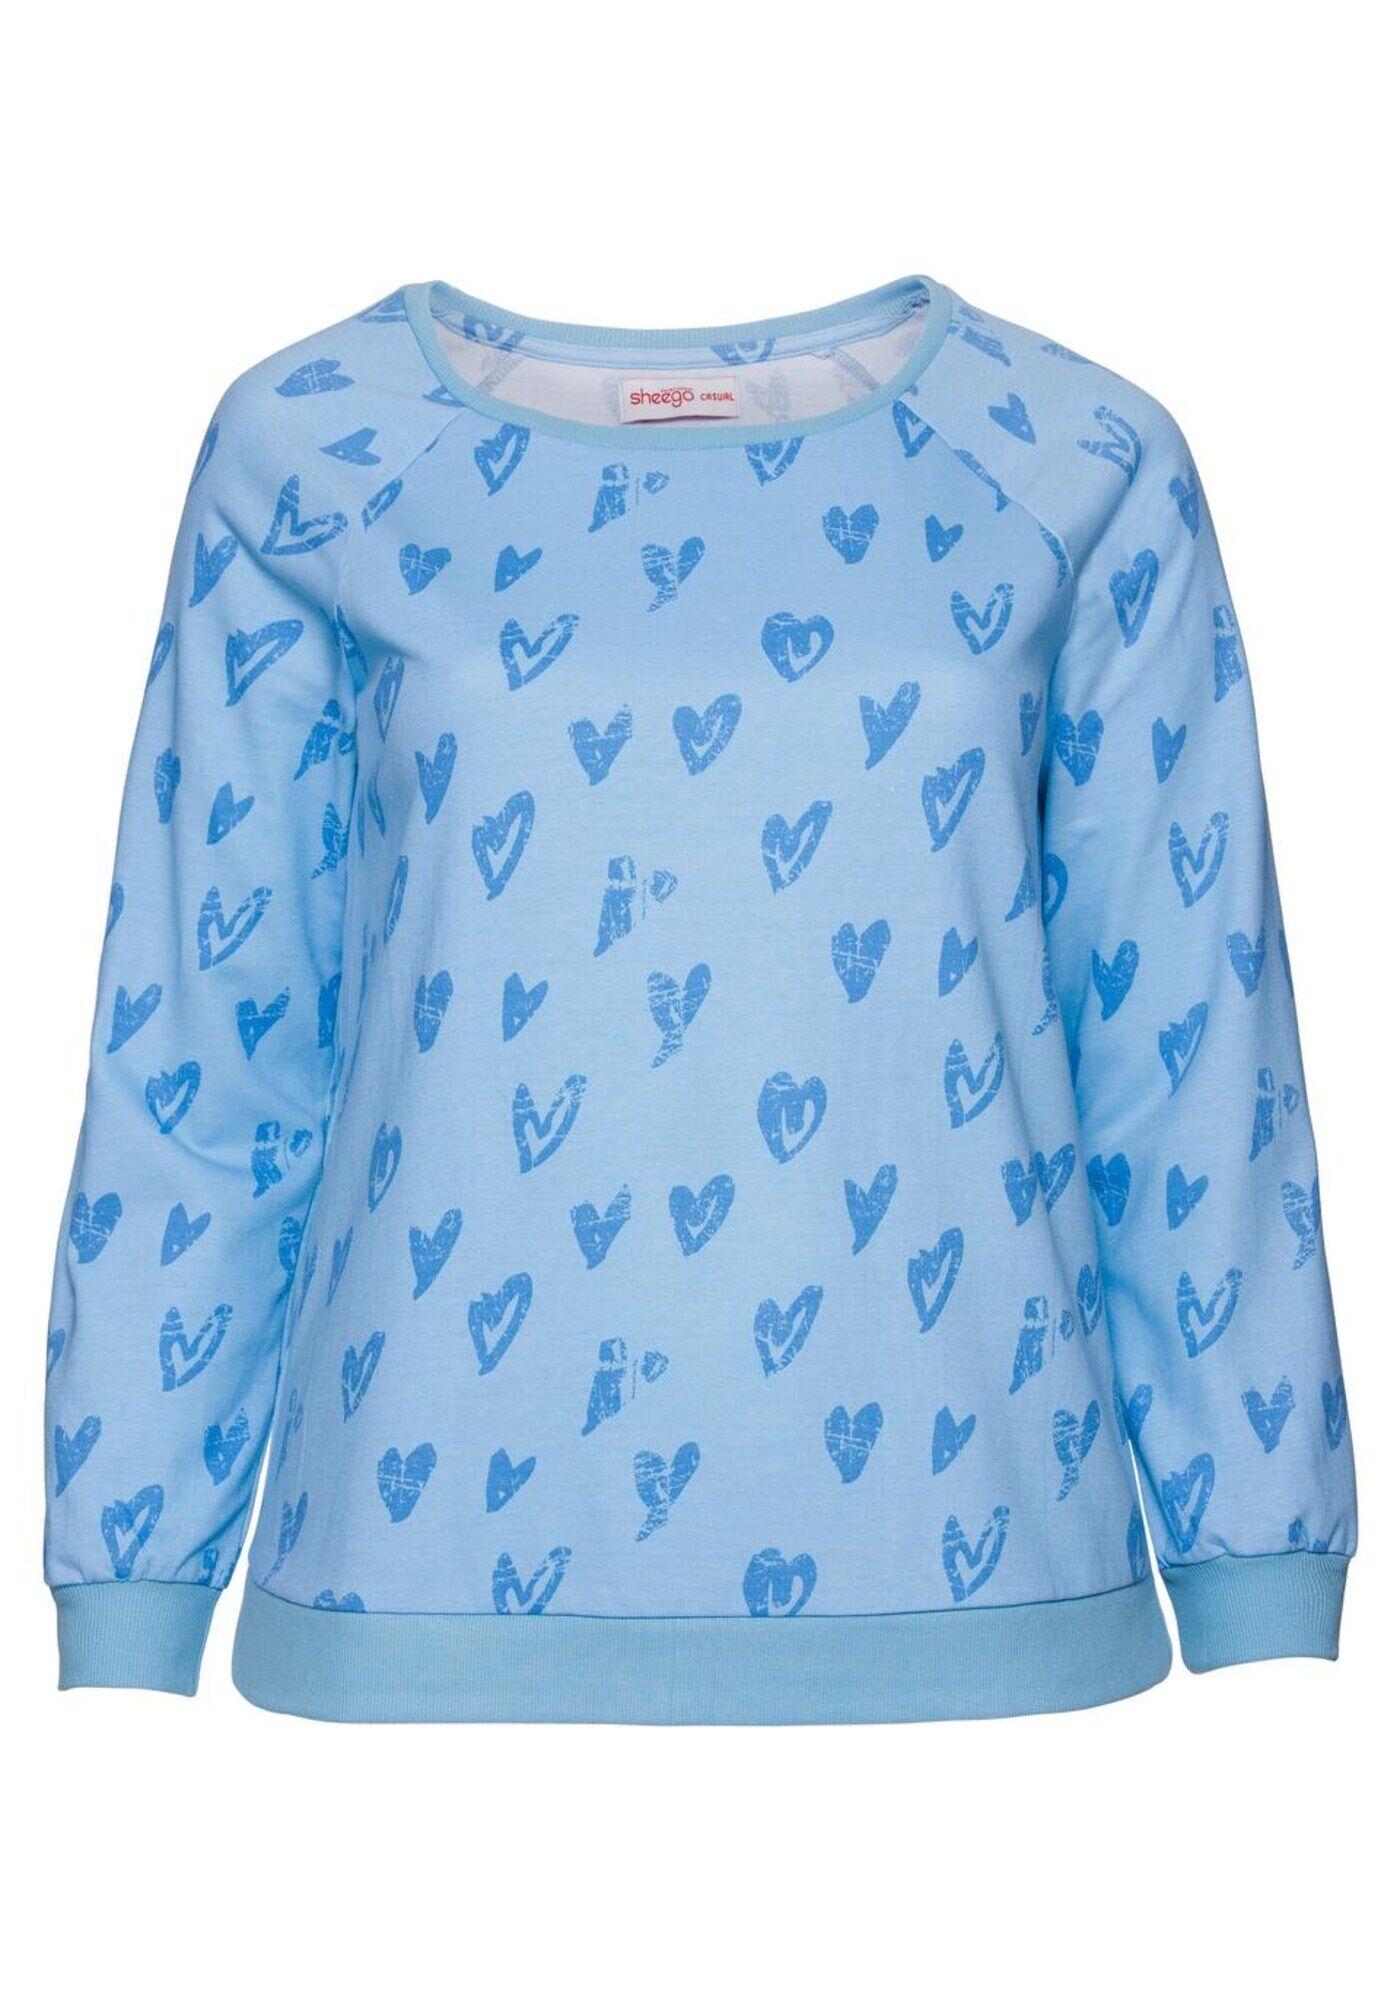 Sheego Casual Sweatshirt M-L,L-XL,XL-XXL